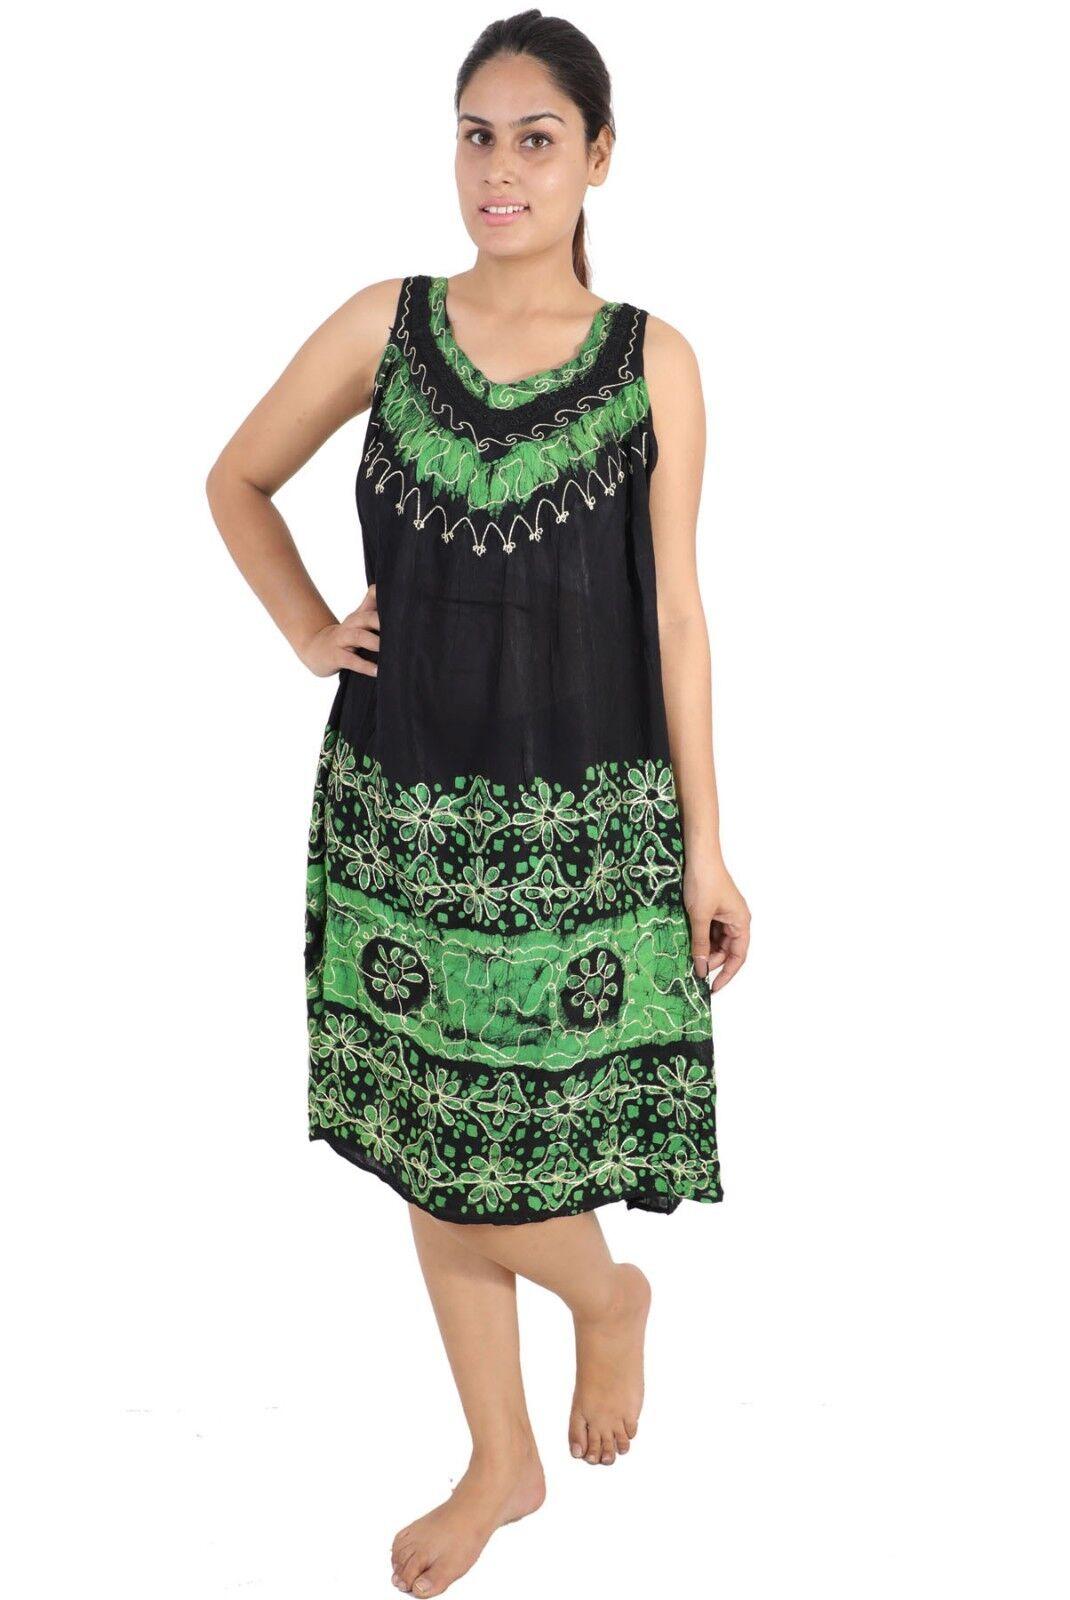 10 pcs Boho Summer Beach Maxi Dress Mix designs et couls